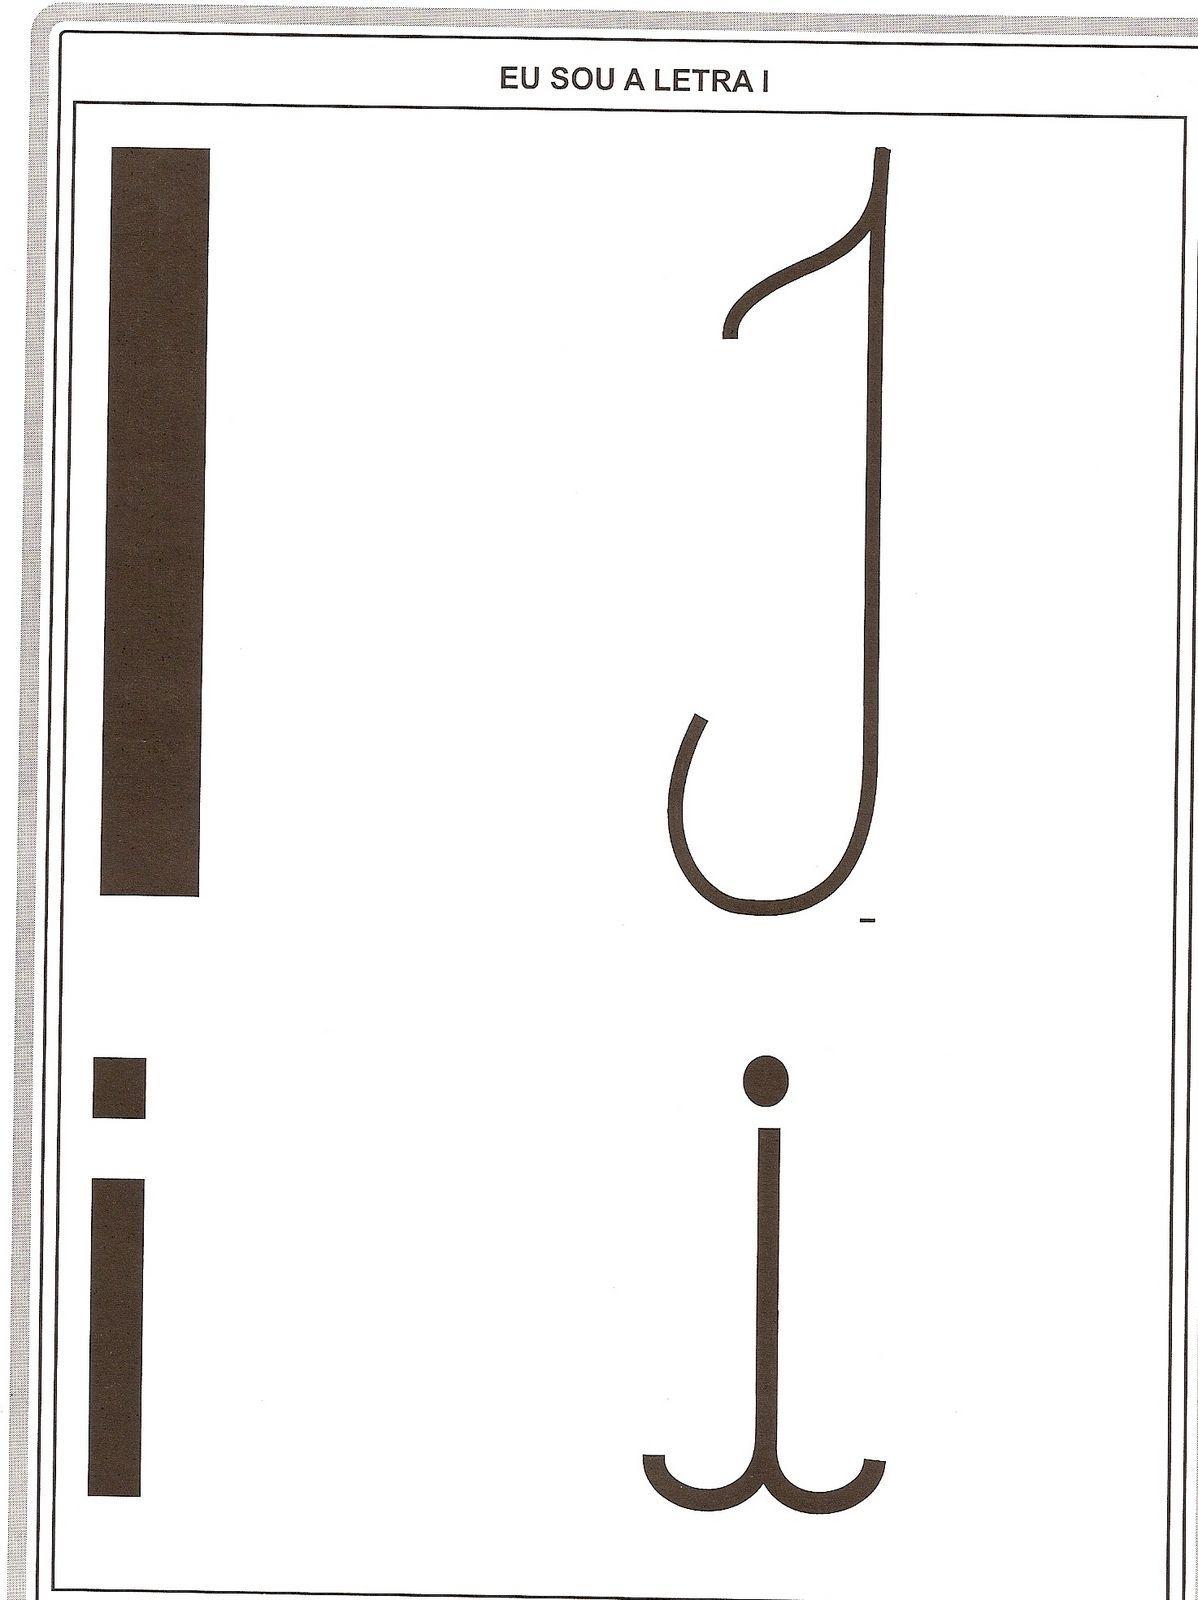 Os 4 Tipo De Letras Alfabeto Modelos De Alfabeto Tipos De Letras